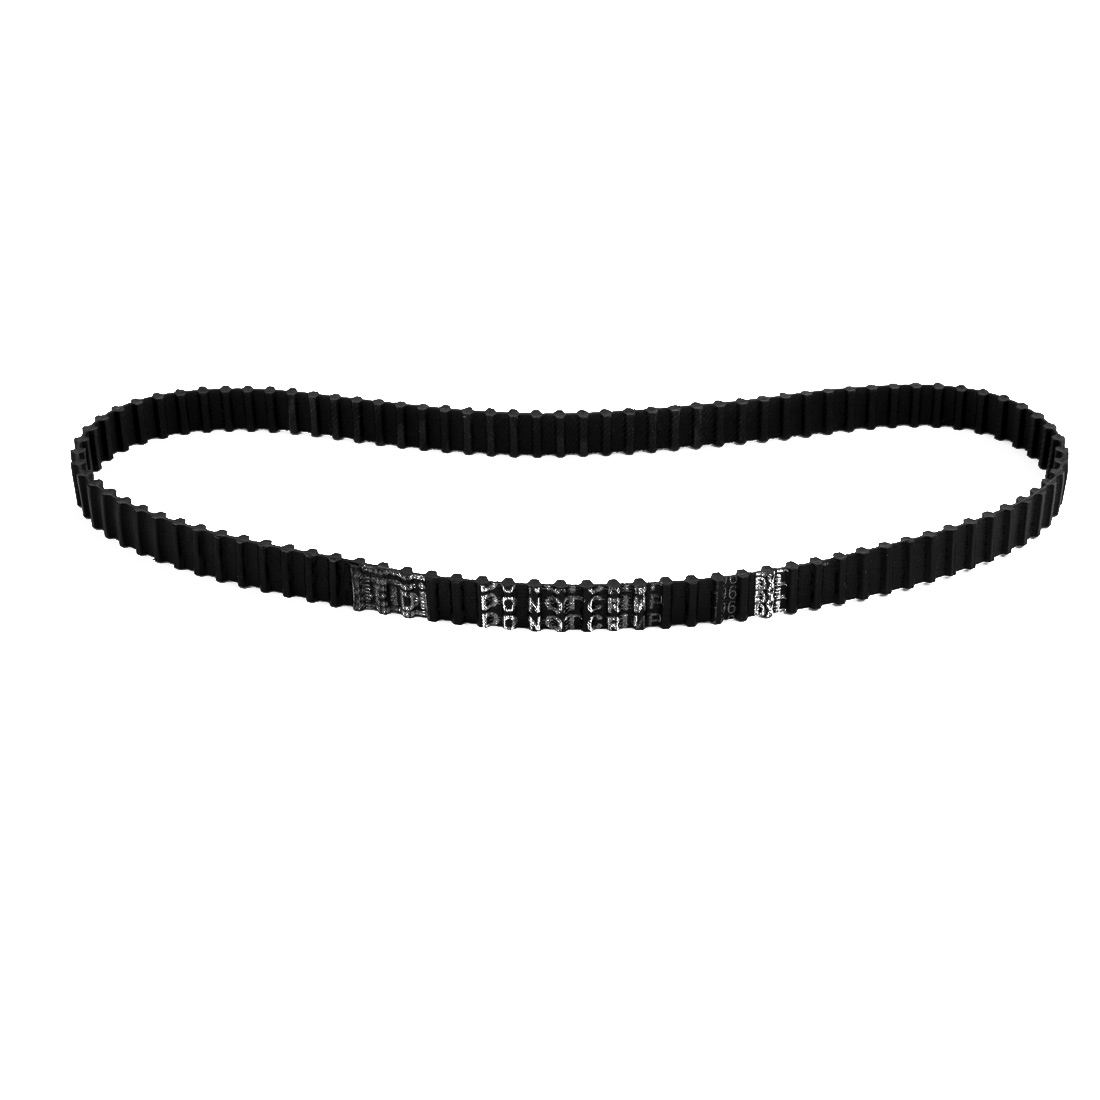 196DXL 96 Teeth 10mm Width 5.08mm Pitch Stepper Motor Rubber Timing Belt Black